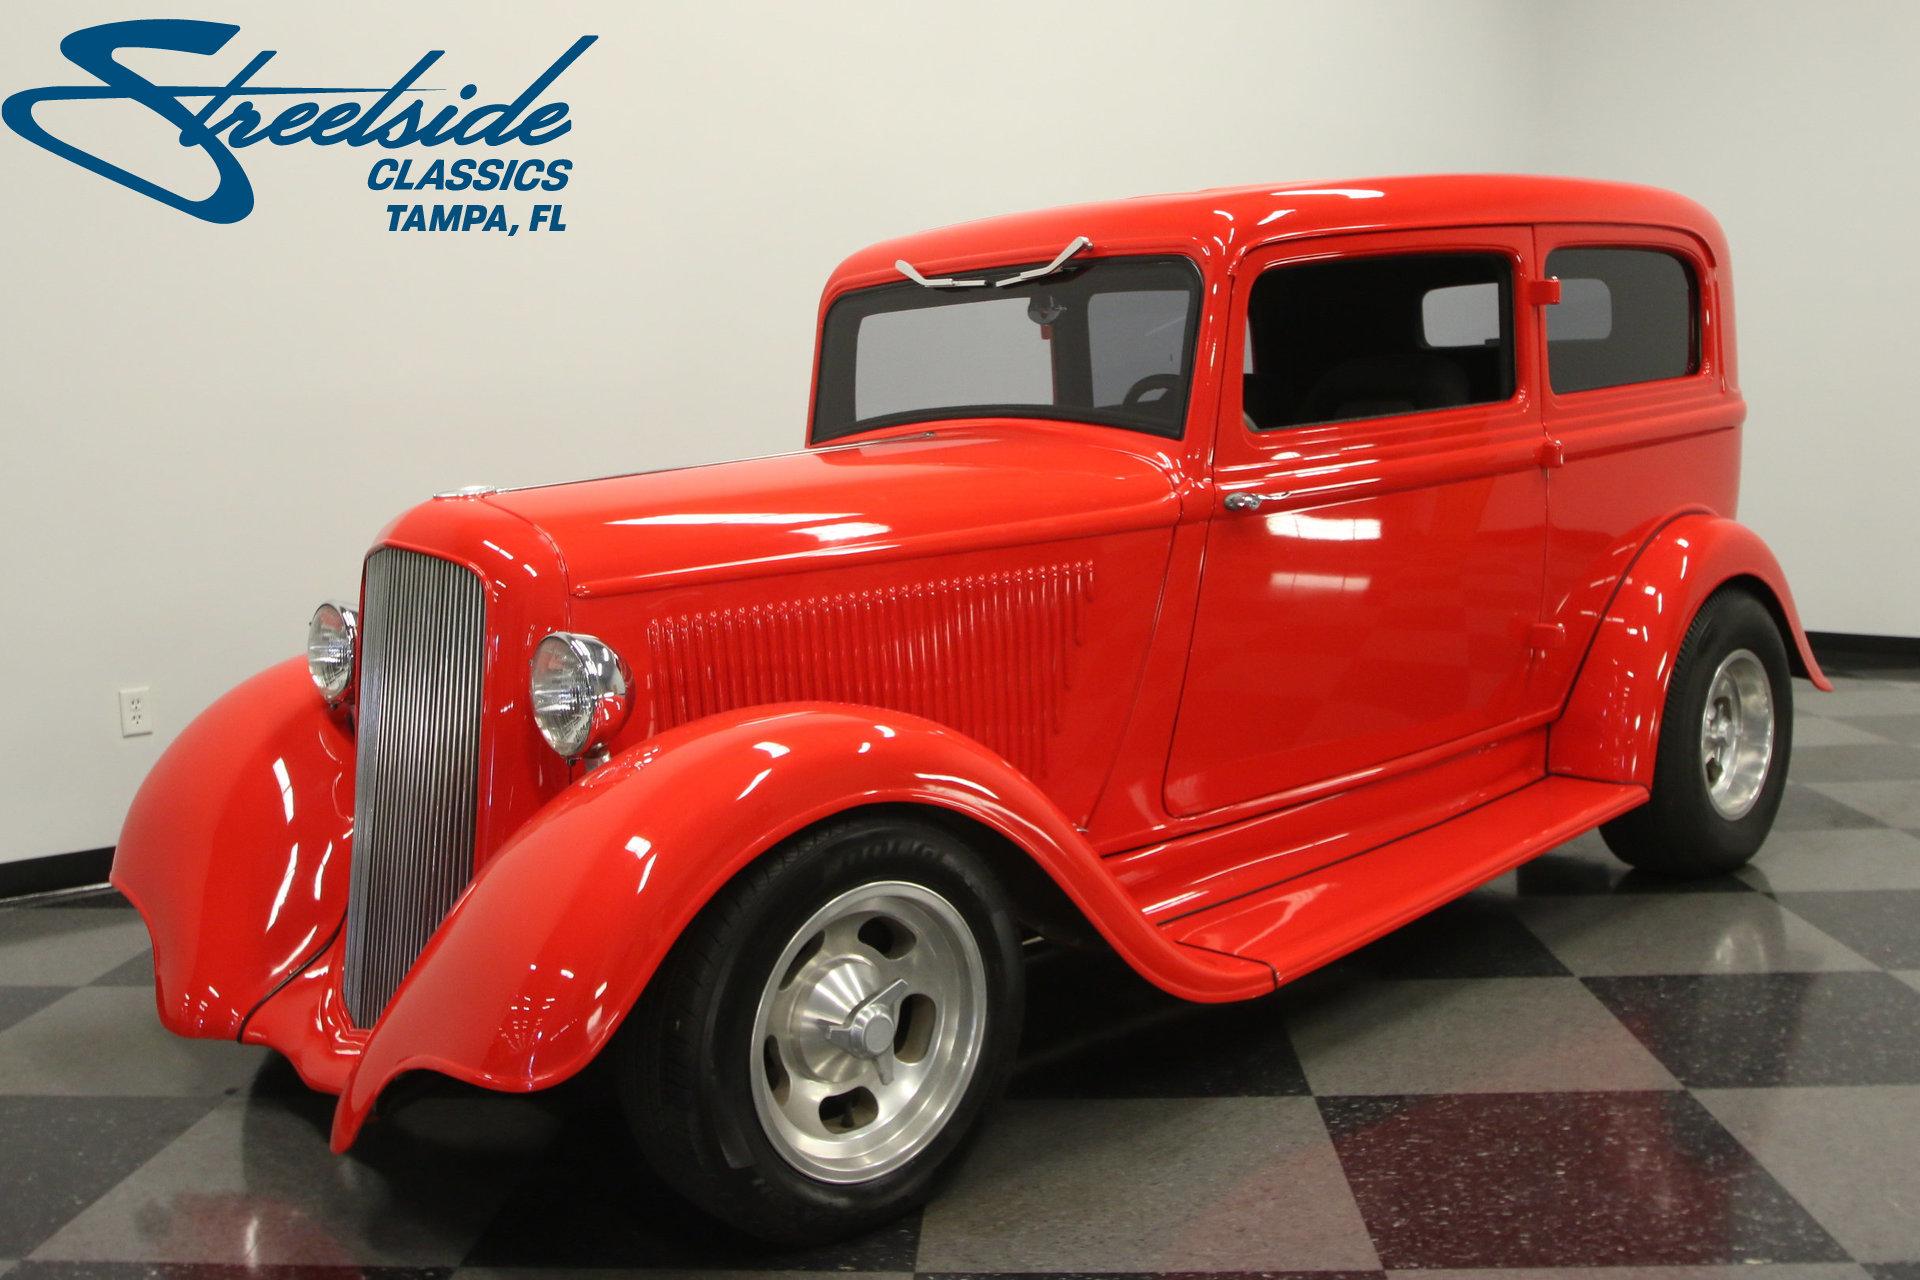 1933 plymouth 2 door touring sedan streetside classics for 1933 plymouth 4 door sedan for sale